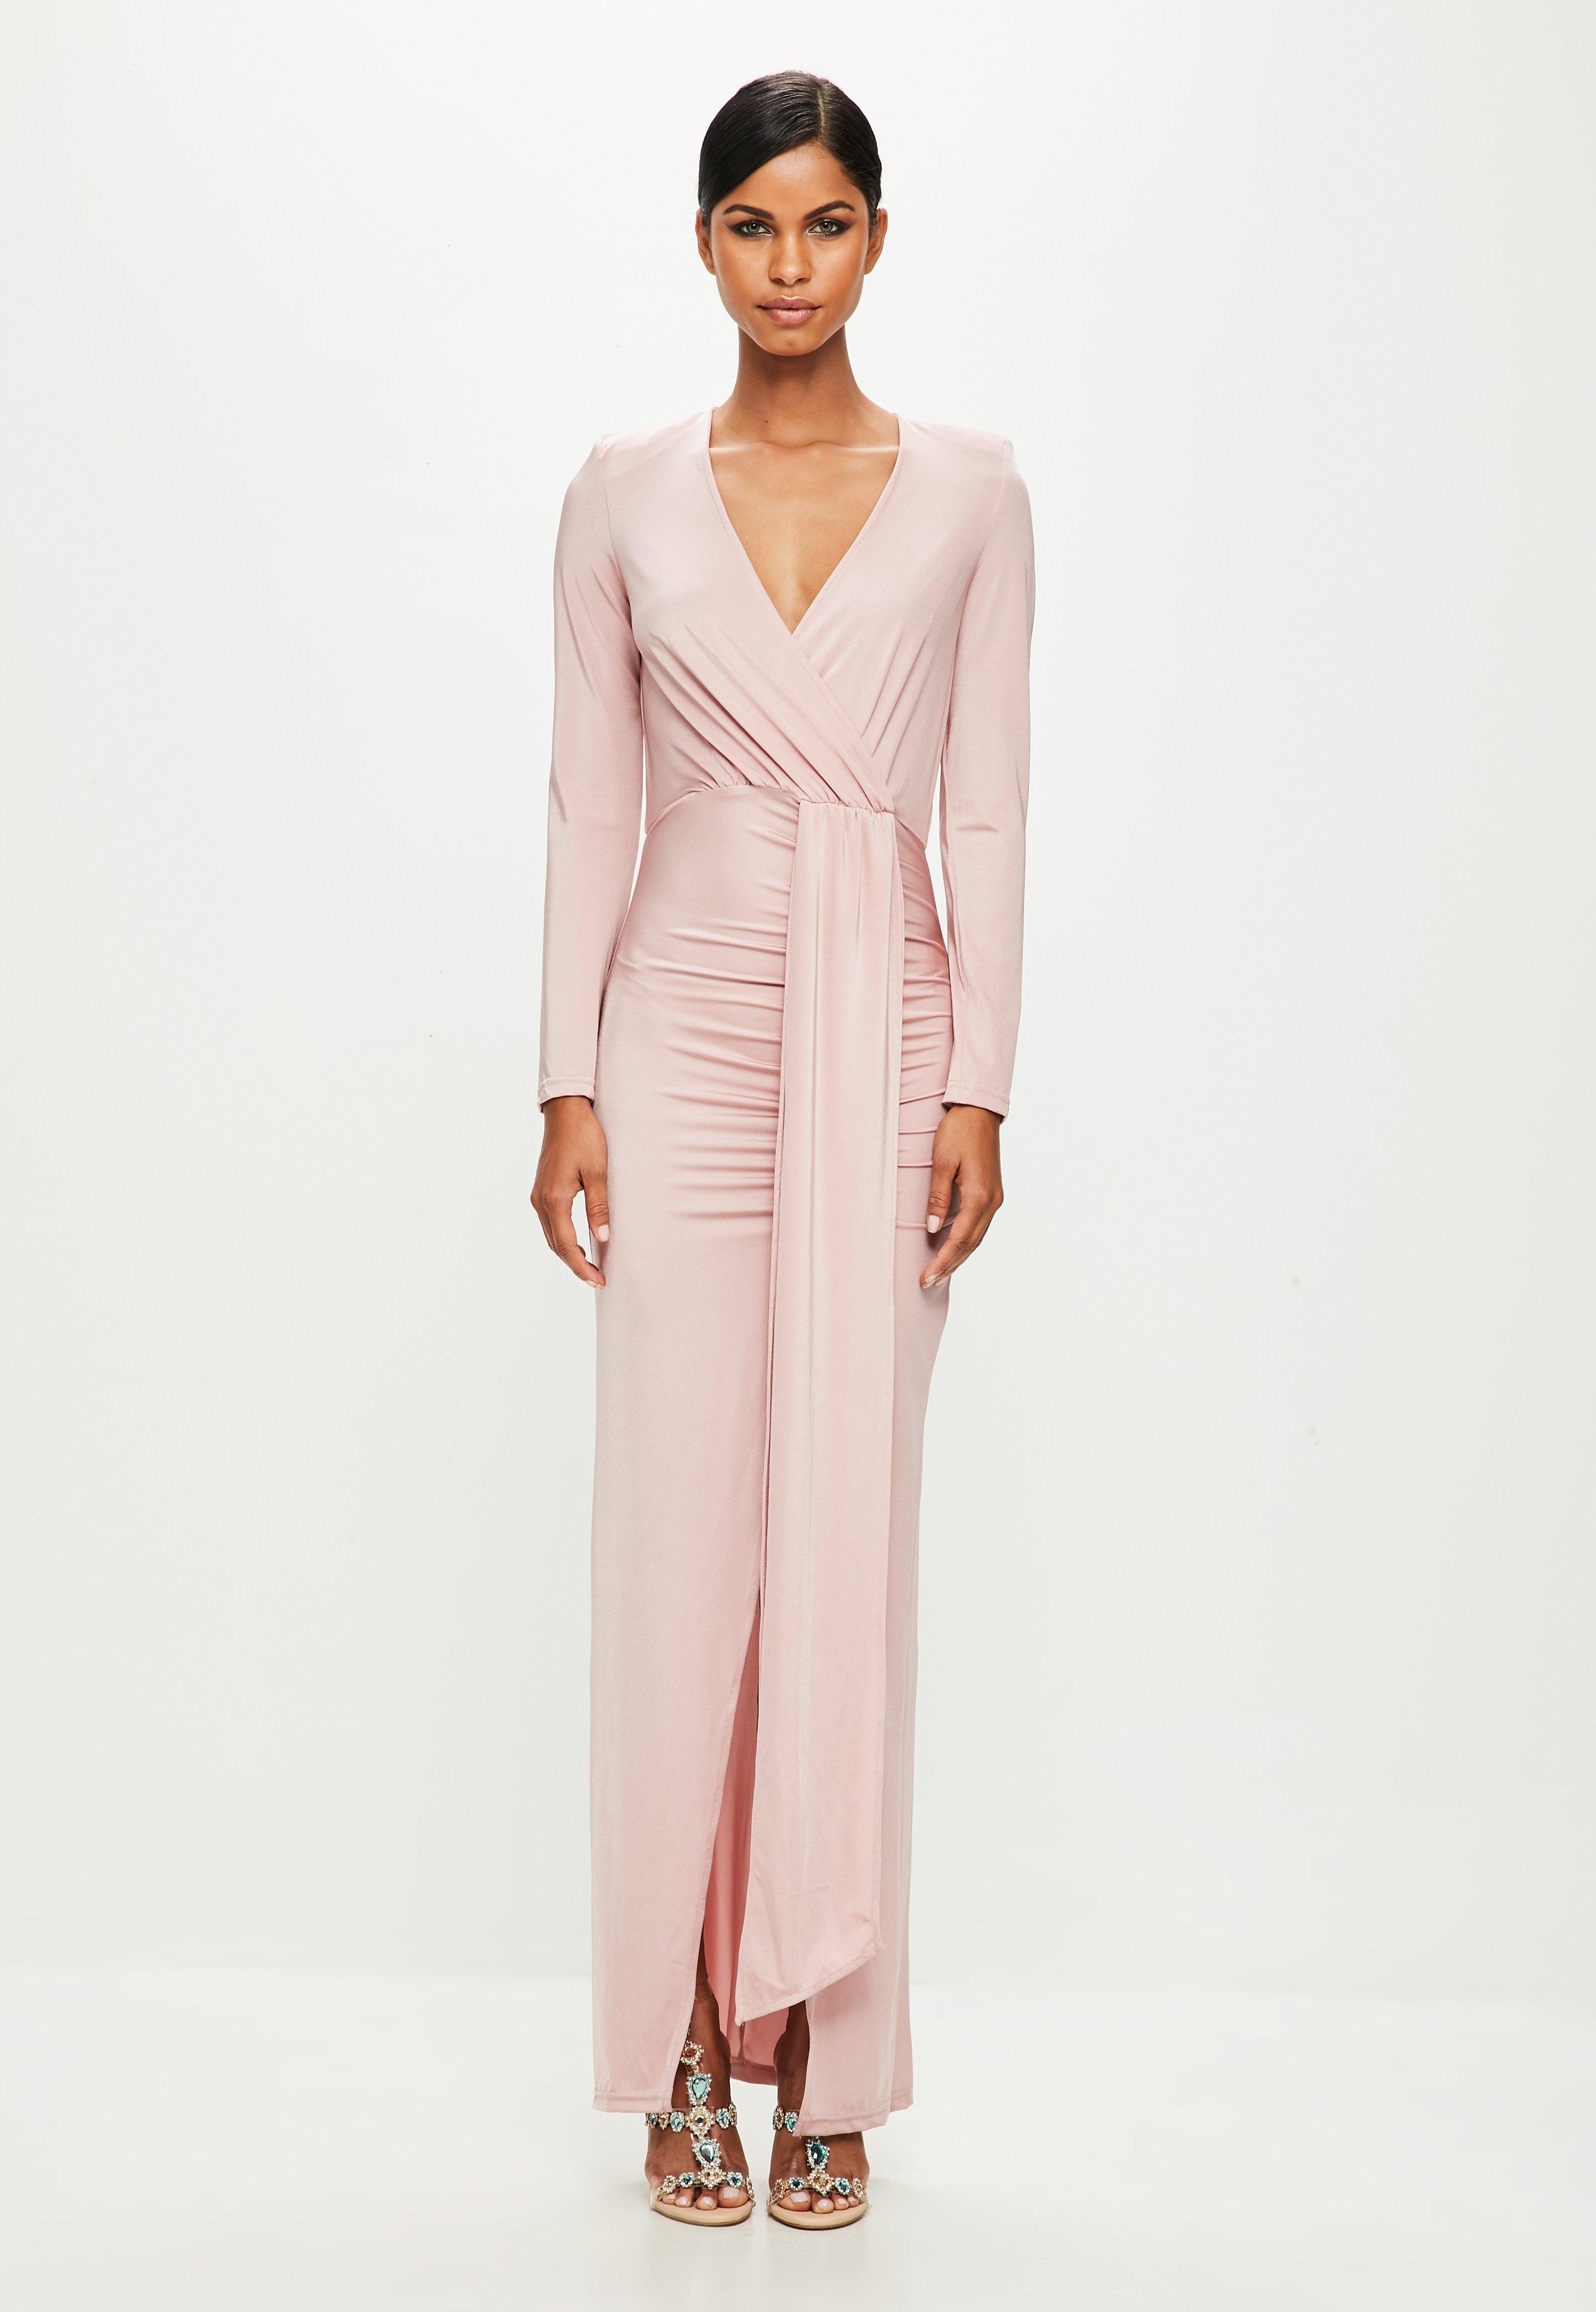 Designer Maxi Long Sleeve Dresses